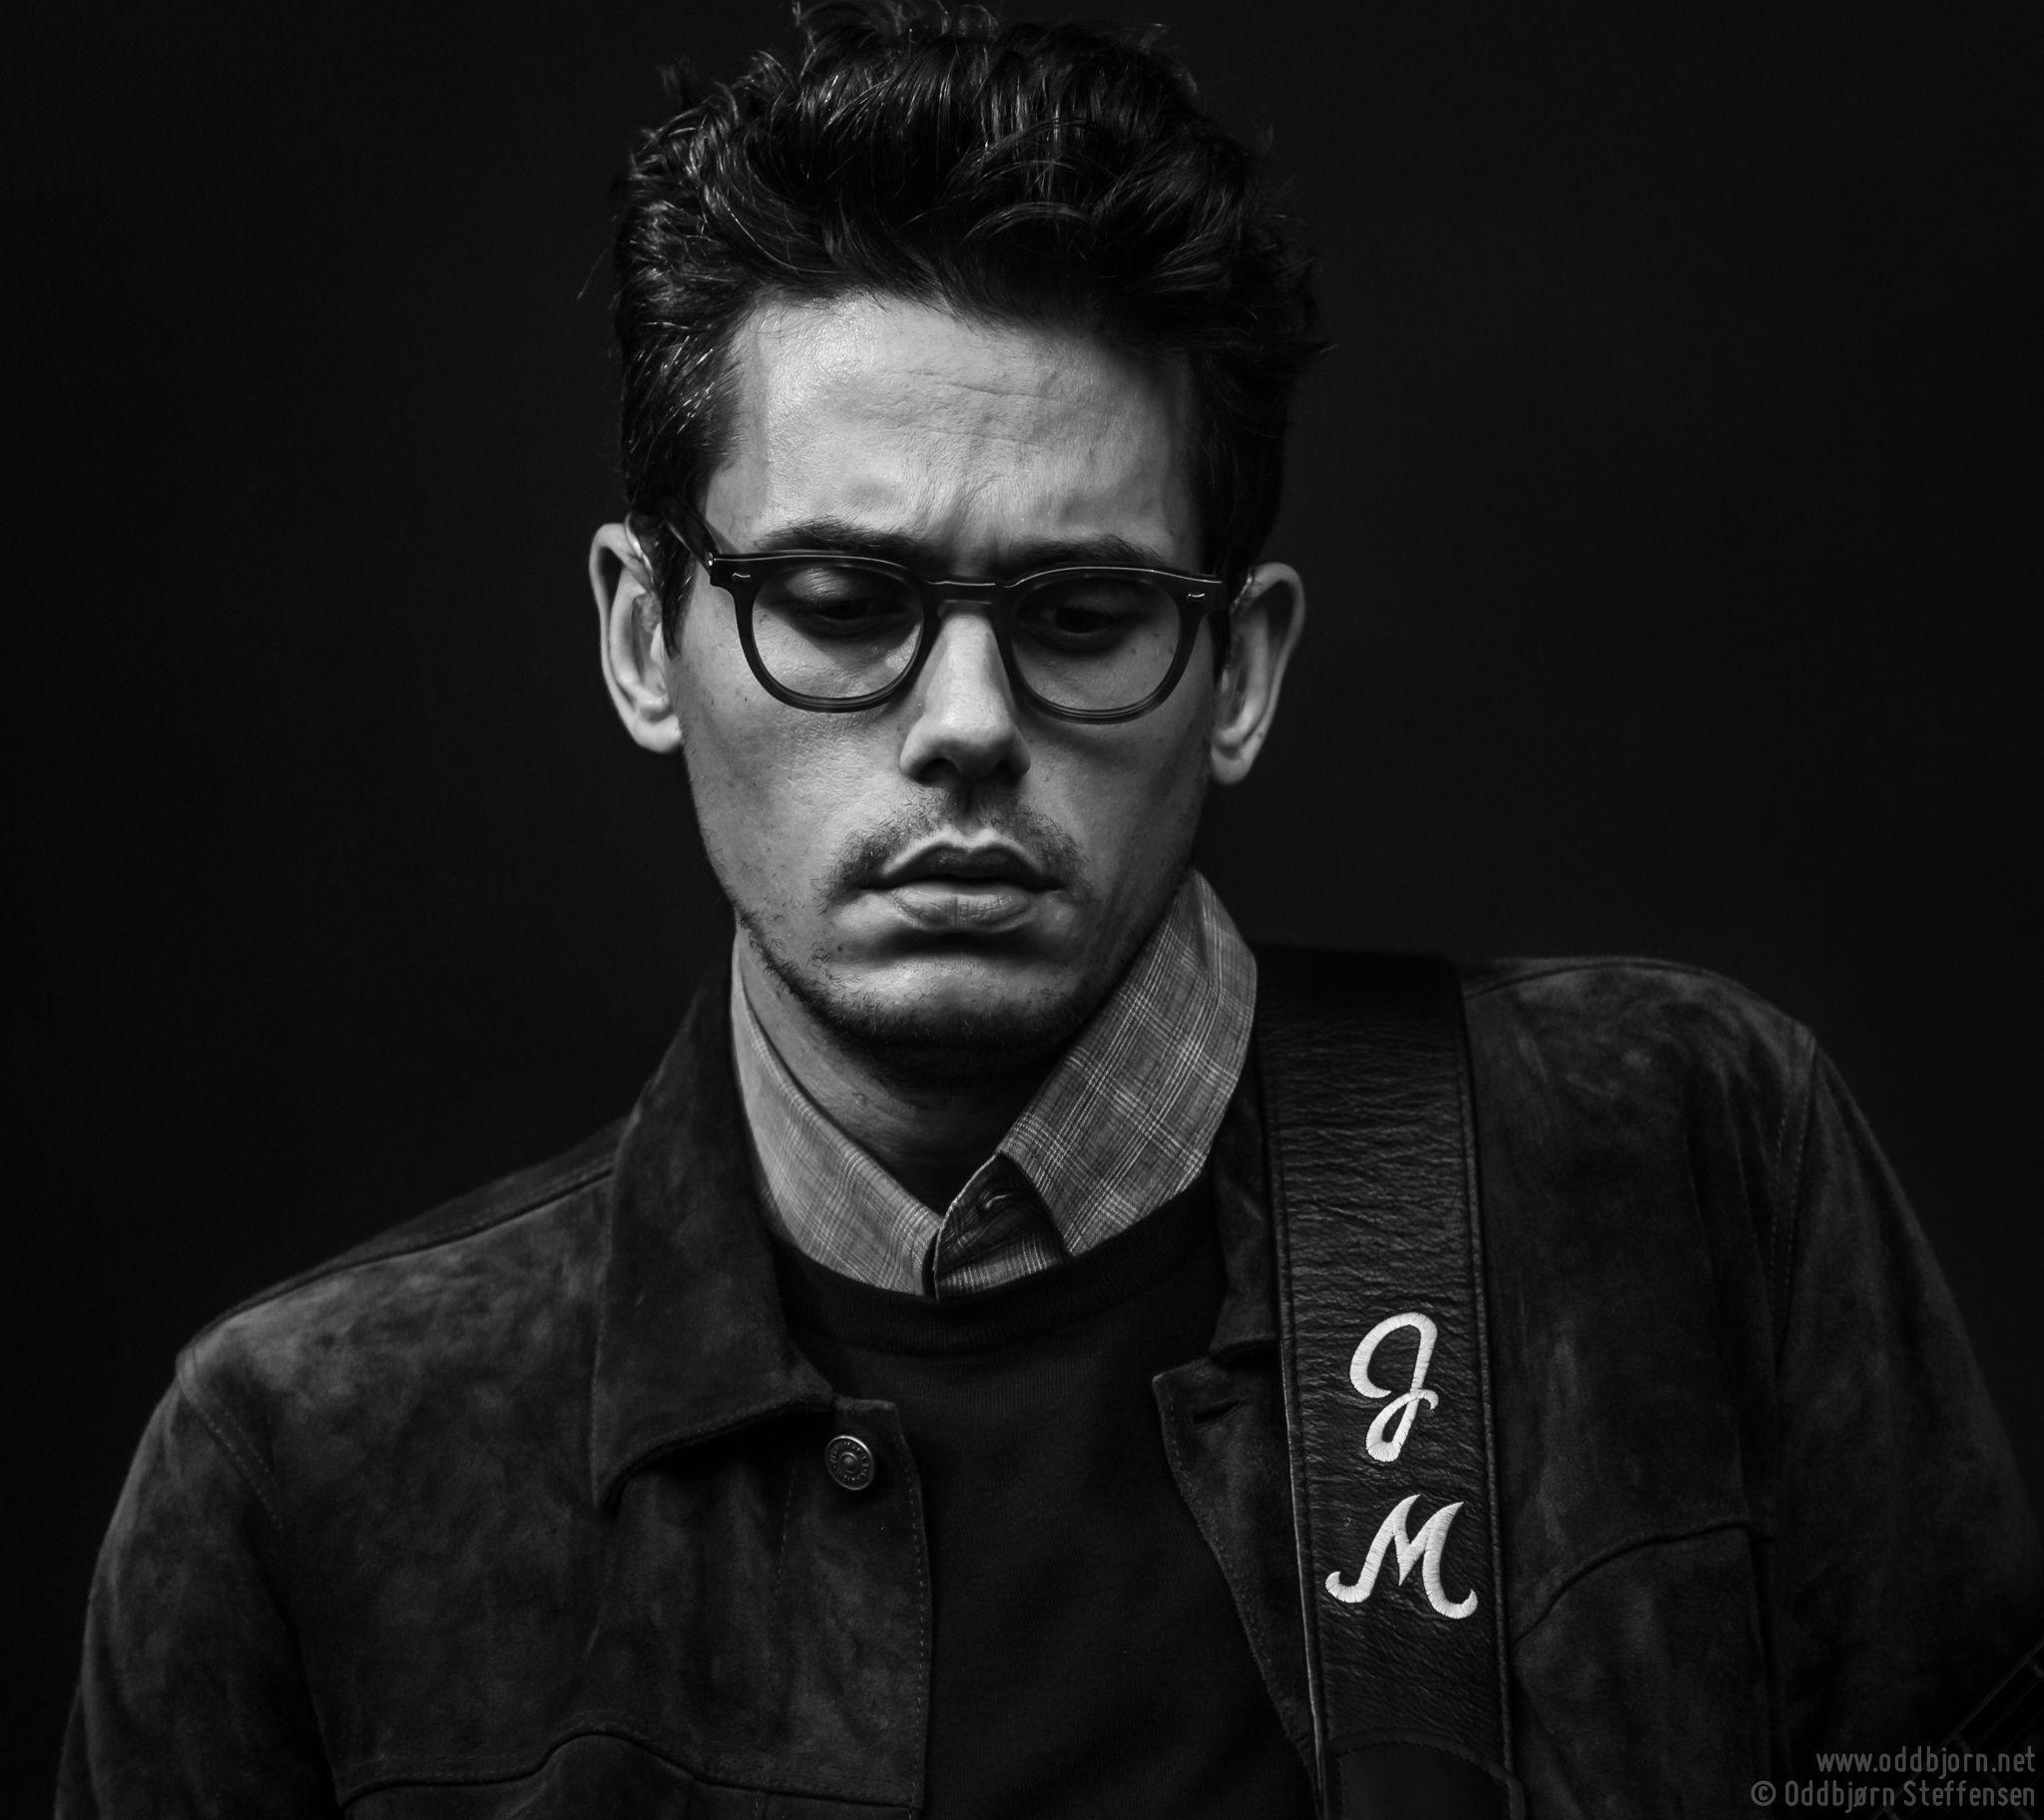 Beautiful John Mayer: Bergenfest 2014: John Mayer By Oddbjørn Steffensen On